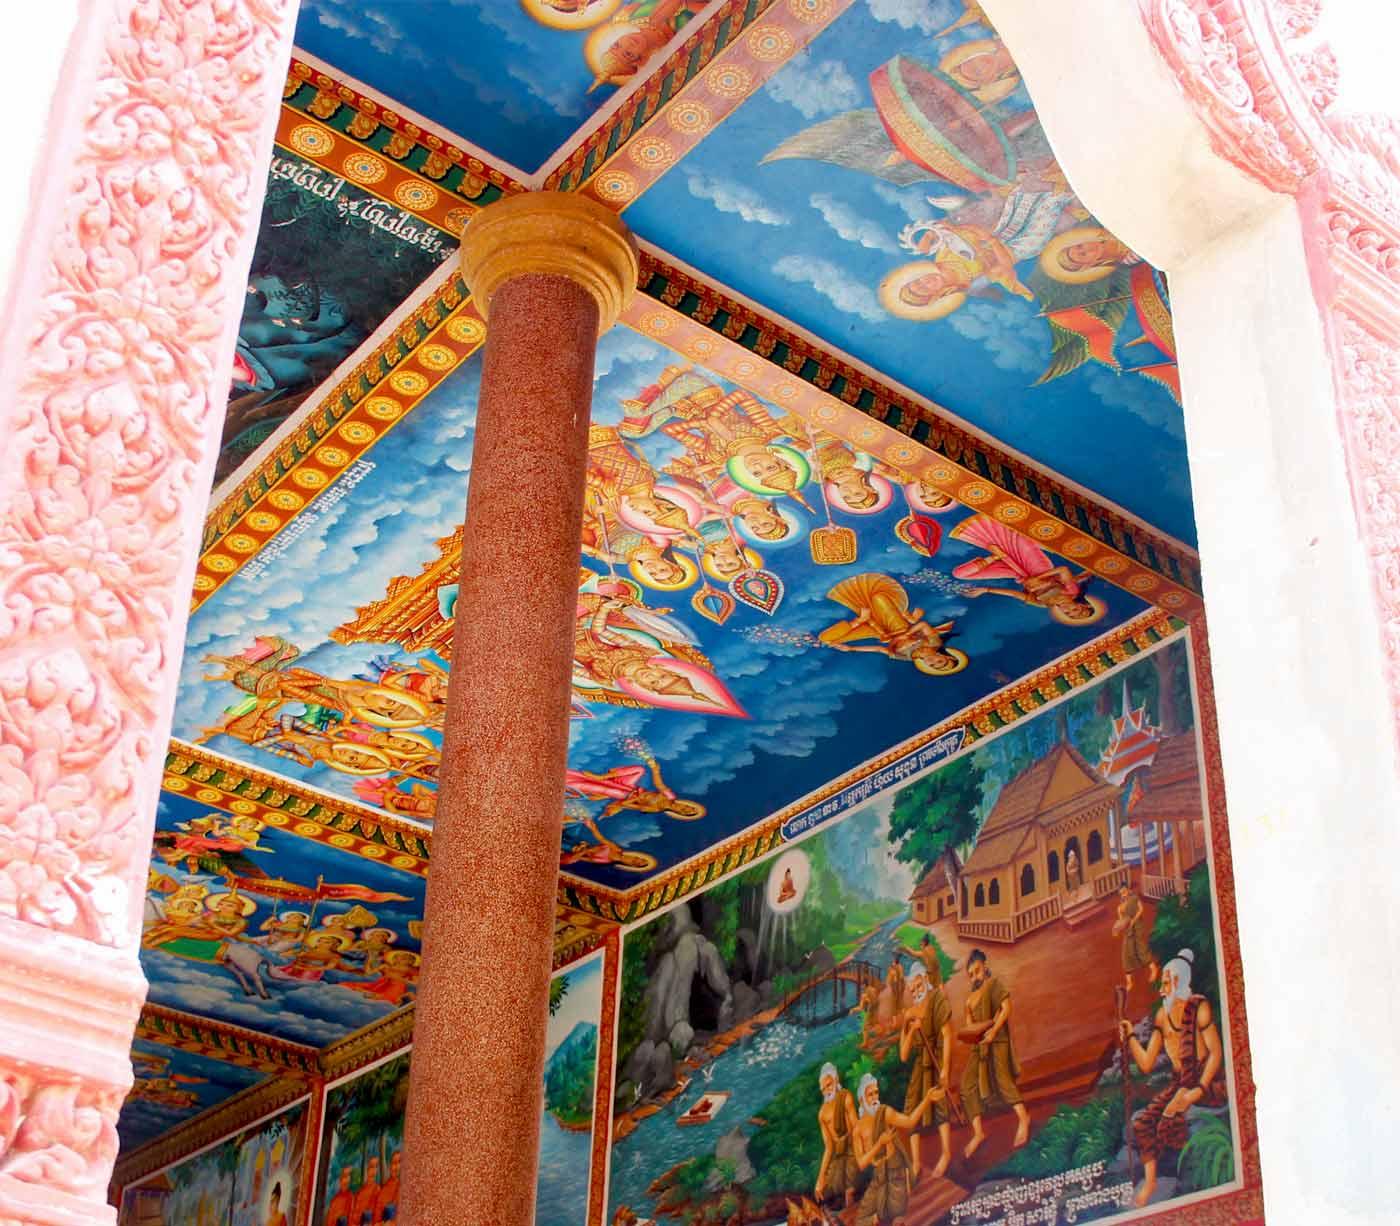 Wandmalerei Pagode in Siem Reap